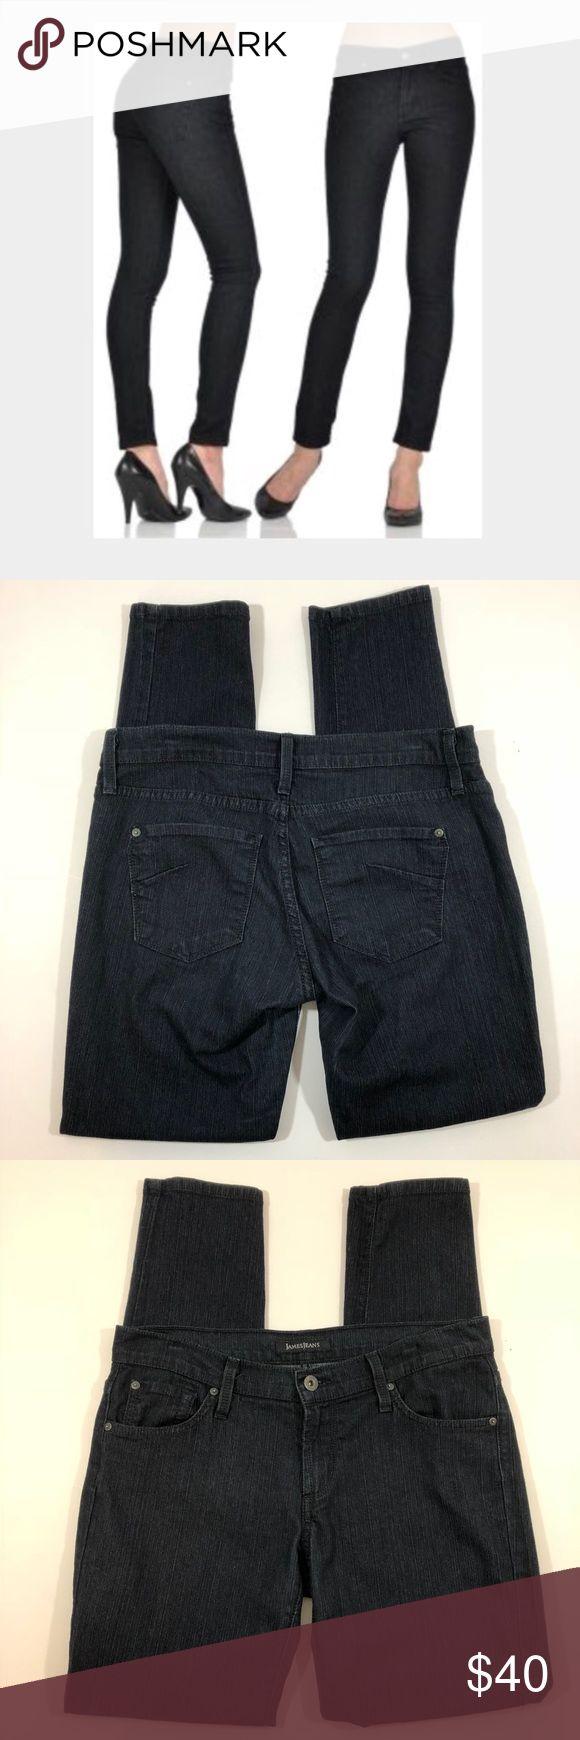 "James Jeans Twiggy Sway Skinny 29 James Jeans Twiggy Sway Skinny Dark Wash Size 29 Inseam 30"" Rise 8"" Other measurements in photos. B3-8 James Jeans Jeans Skinny"